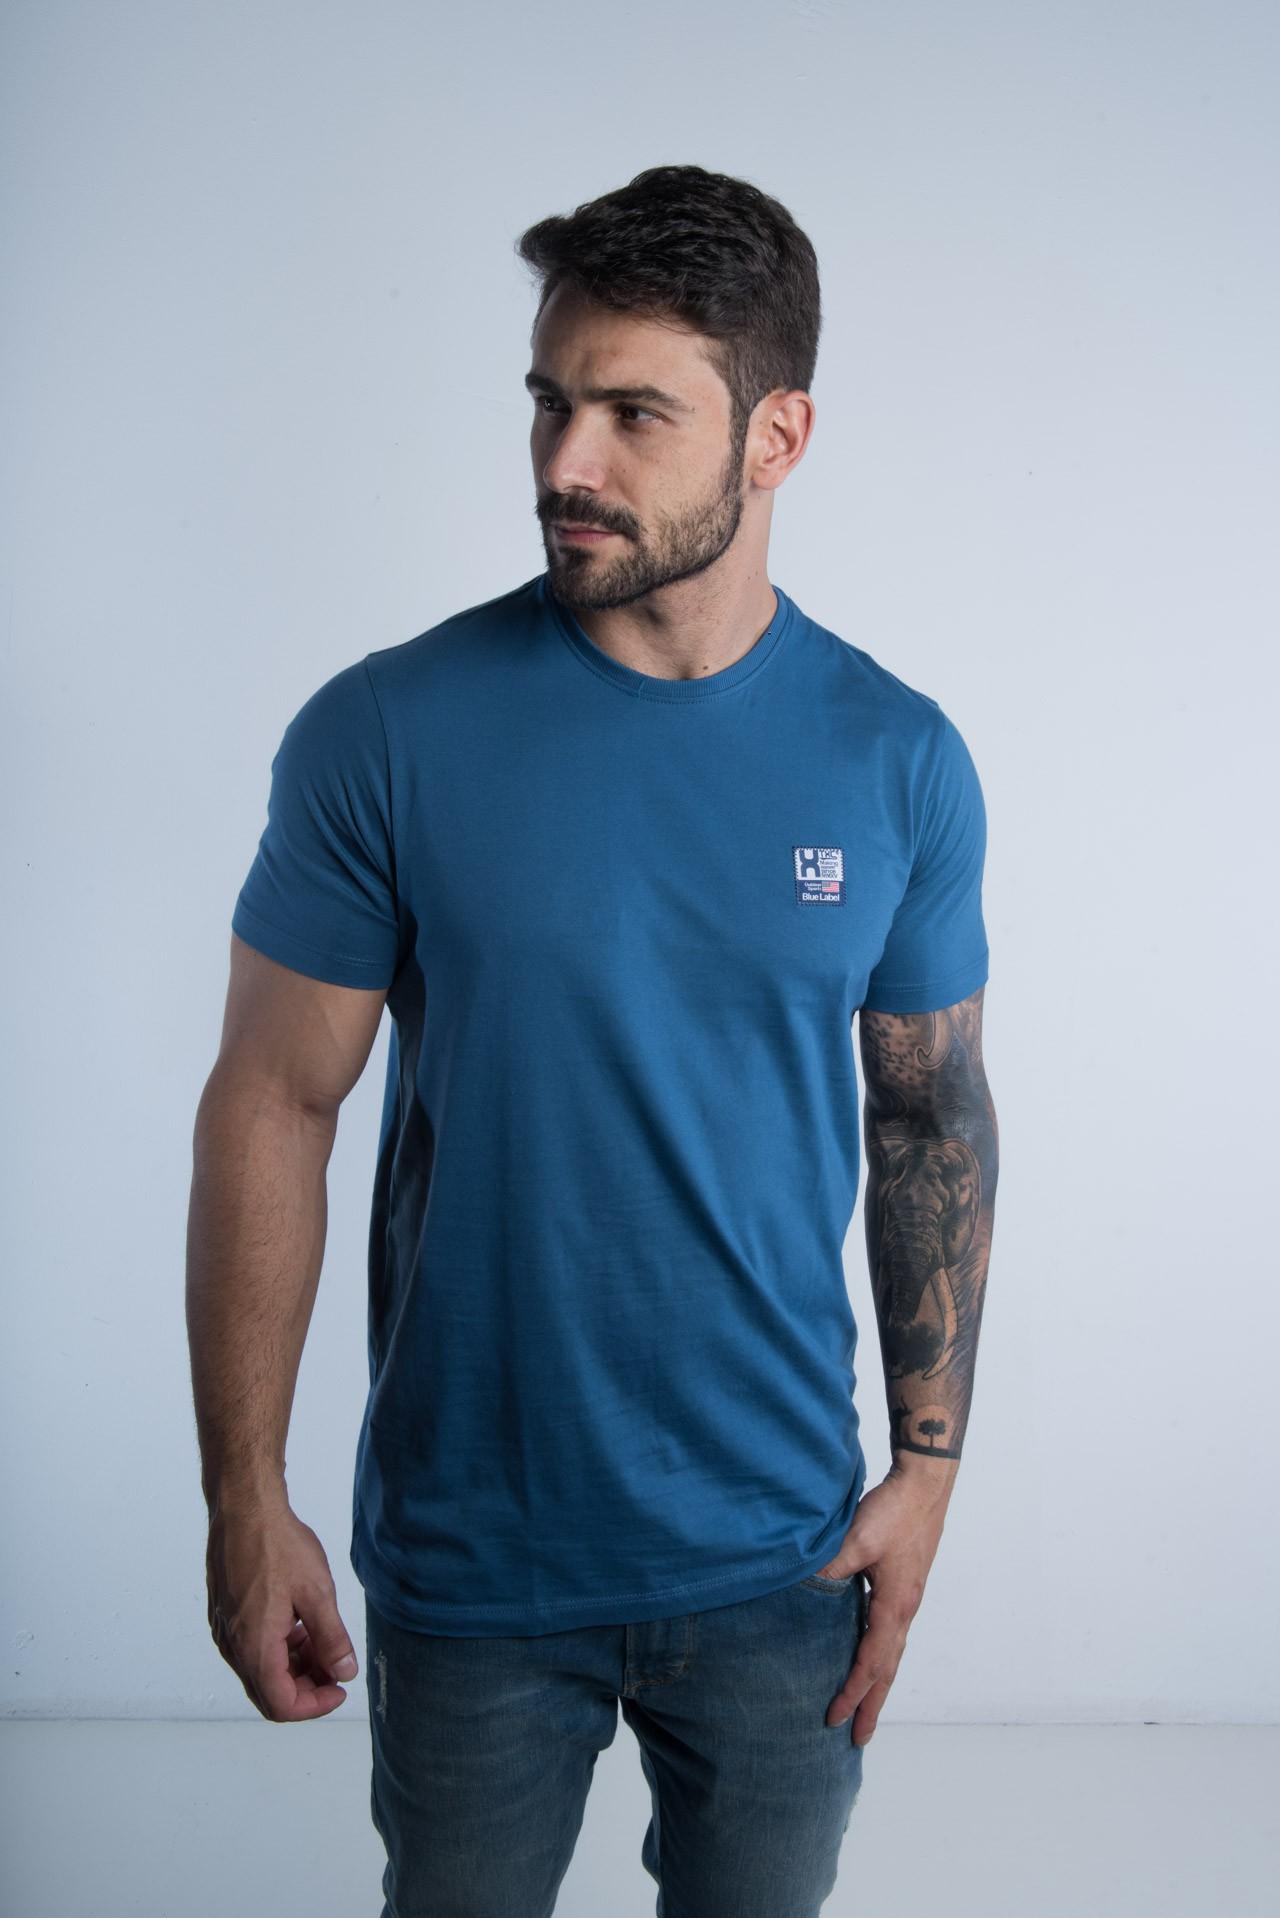 Camiseta Masculina TXC 19101